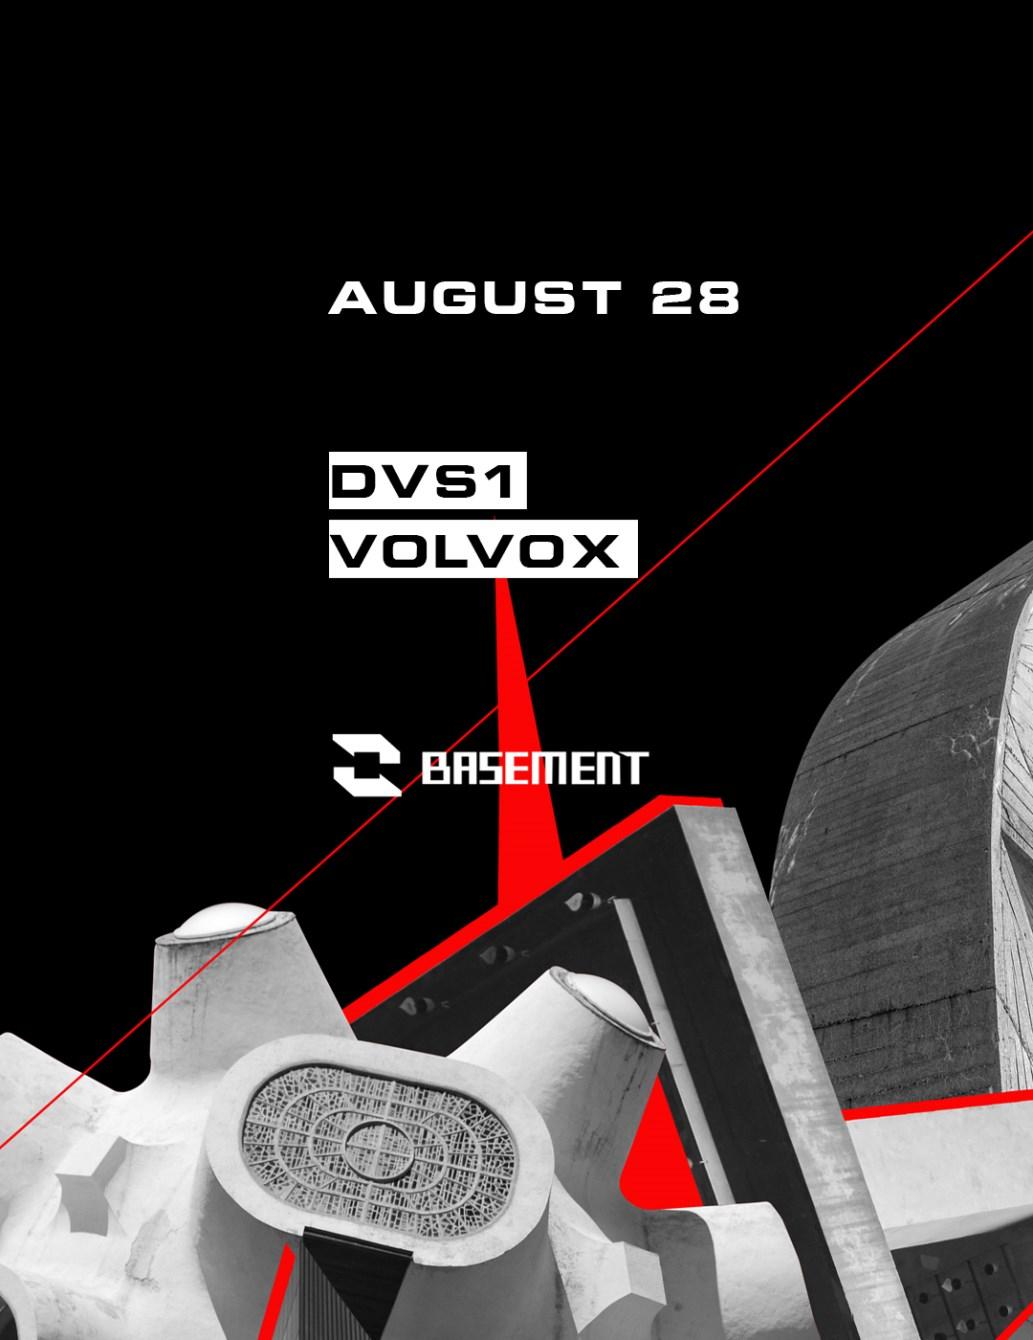 Dvs1 / Volvox - Flyer front